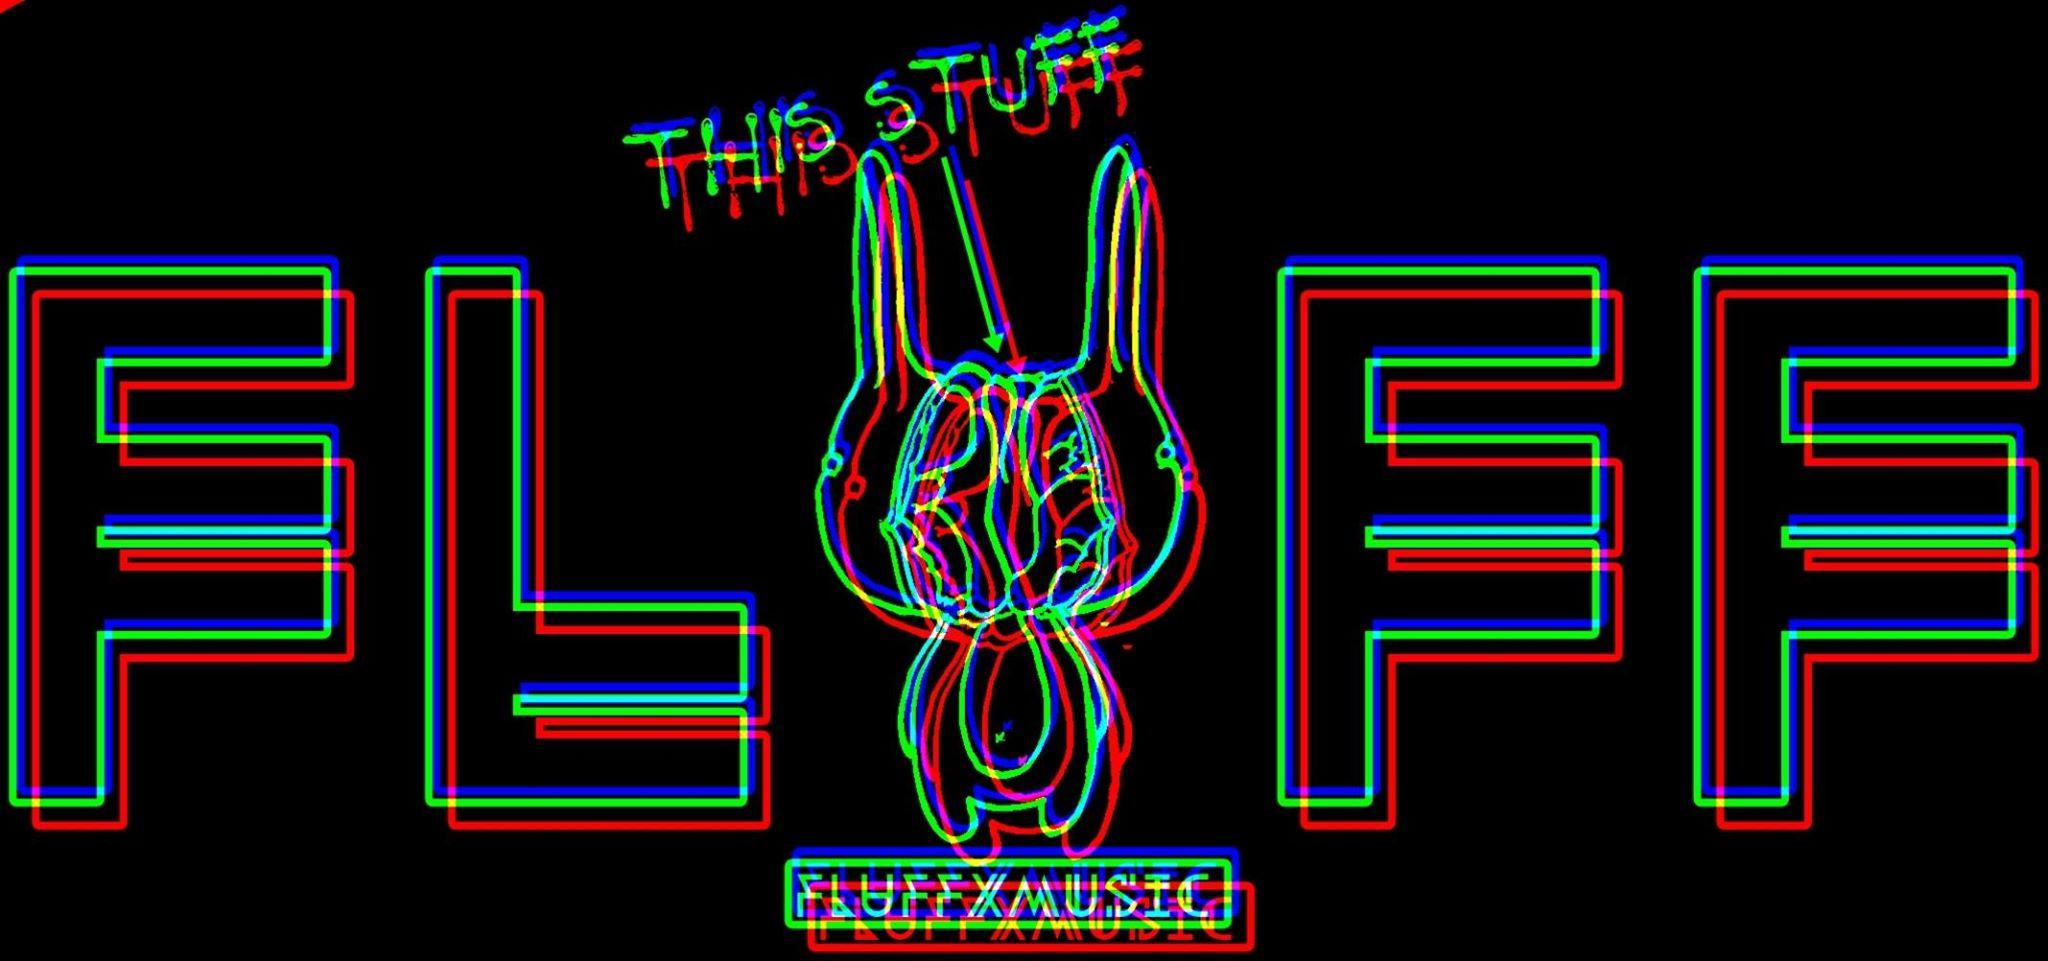 FLUFF BUNNY